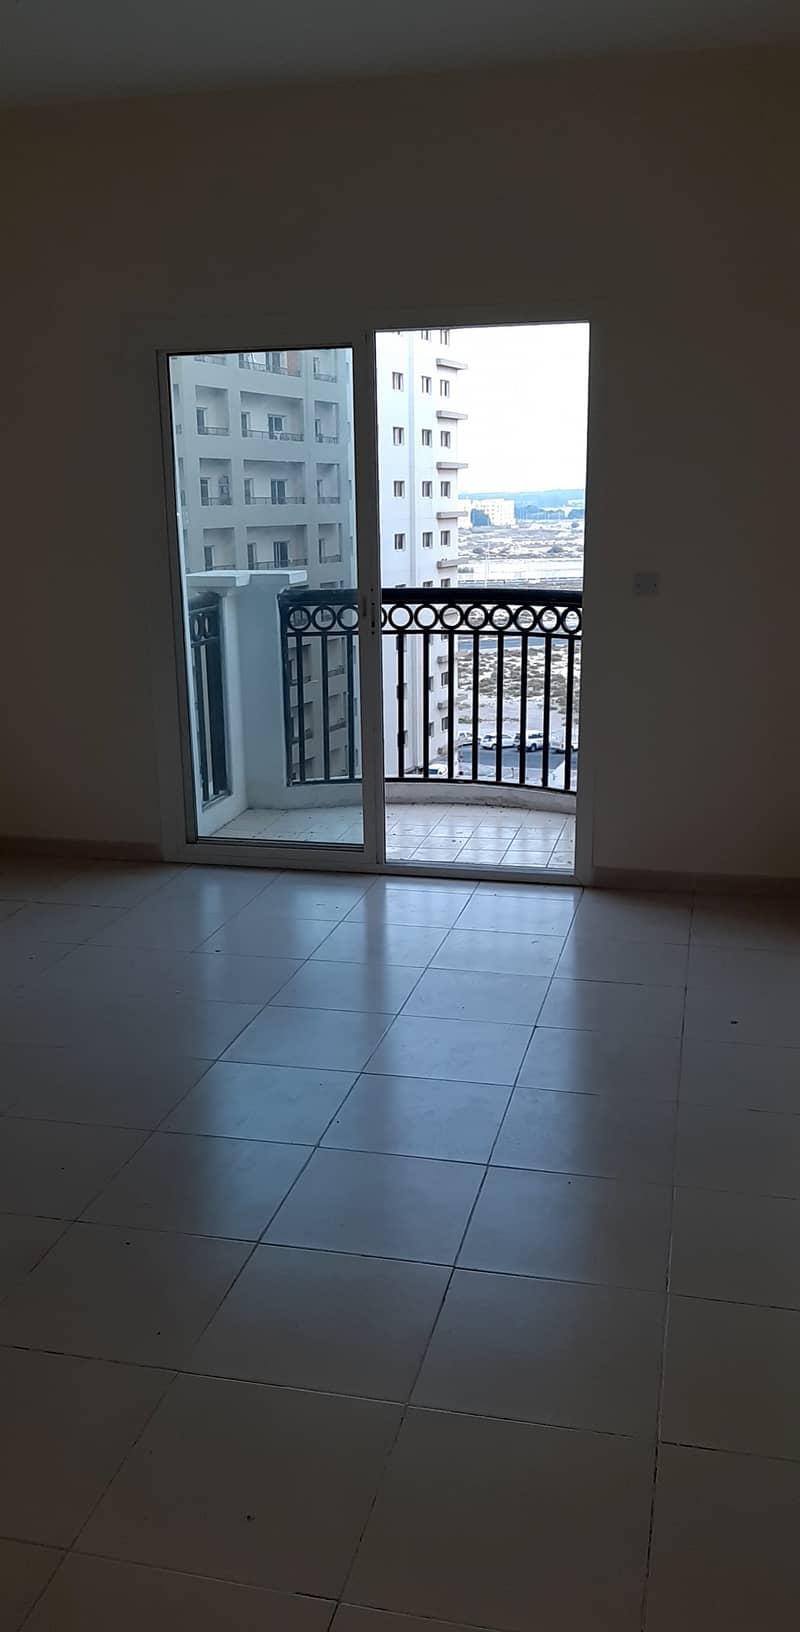 27k 4CHQ 1Bedroom In CBD Riviera Dream With Balcony